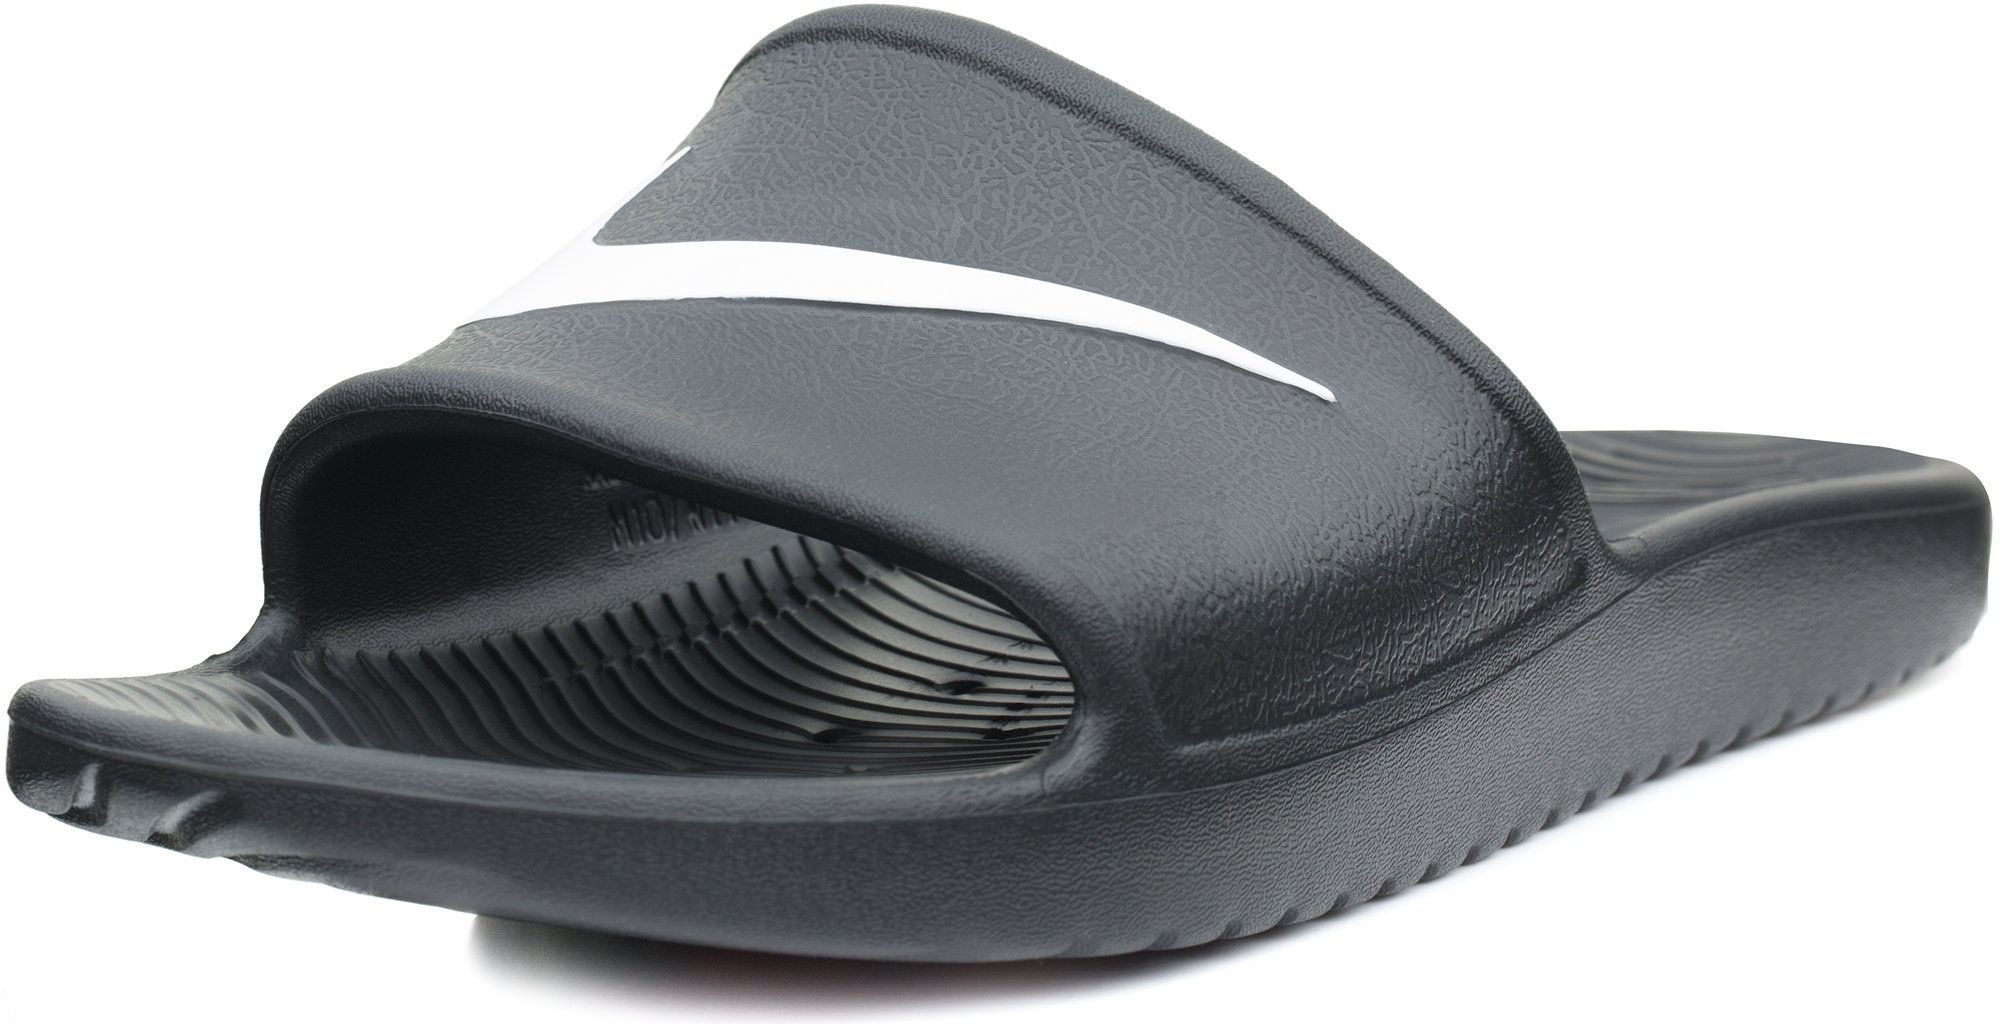 Nike Шлепанцы мужские Nike Kawa Shower, размер 46,5 цена